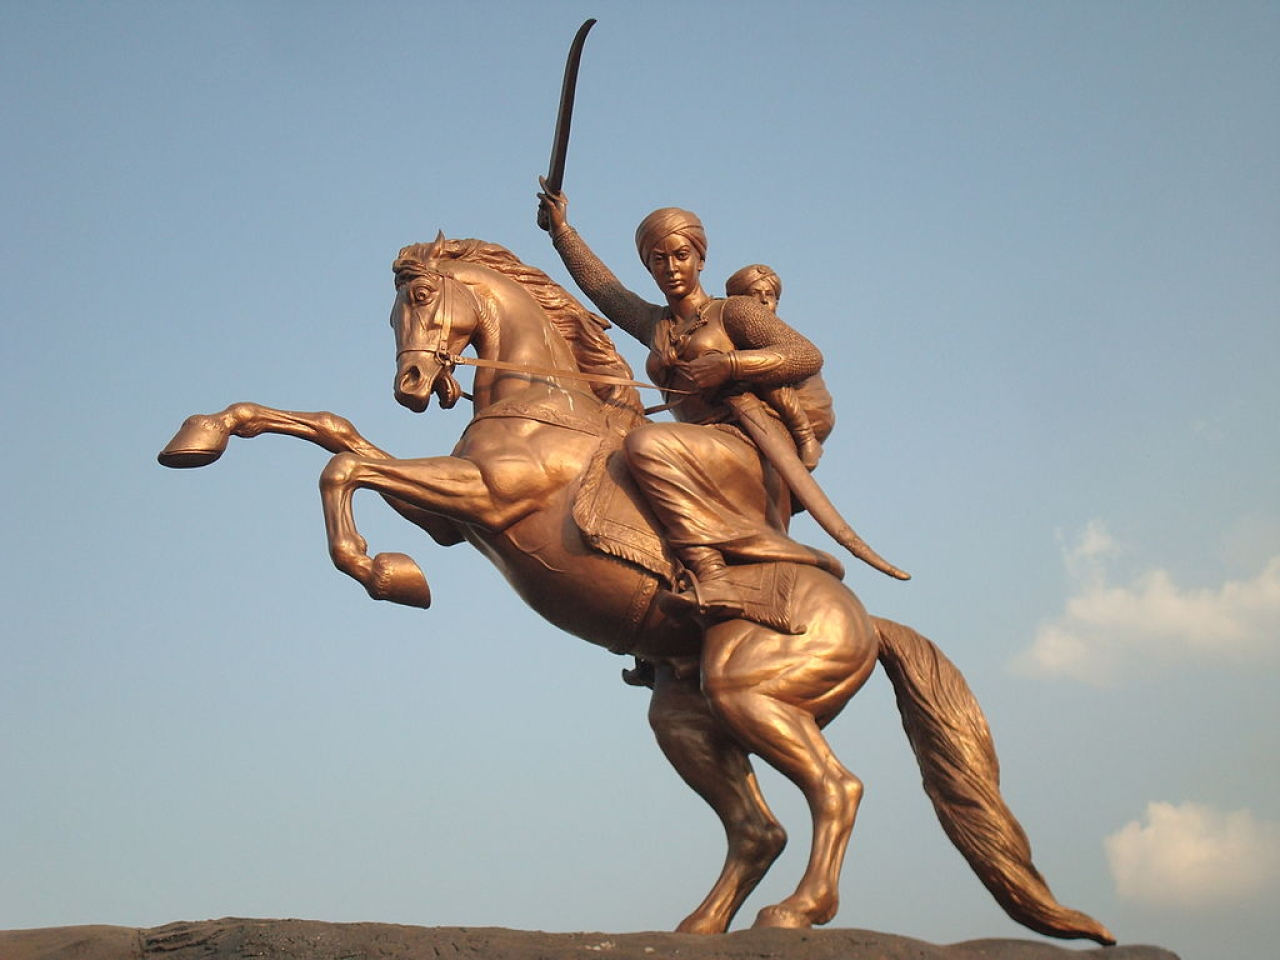 Rani Lakshmibai. (Wikimedia Commons)